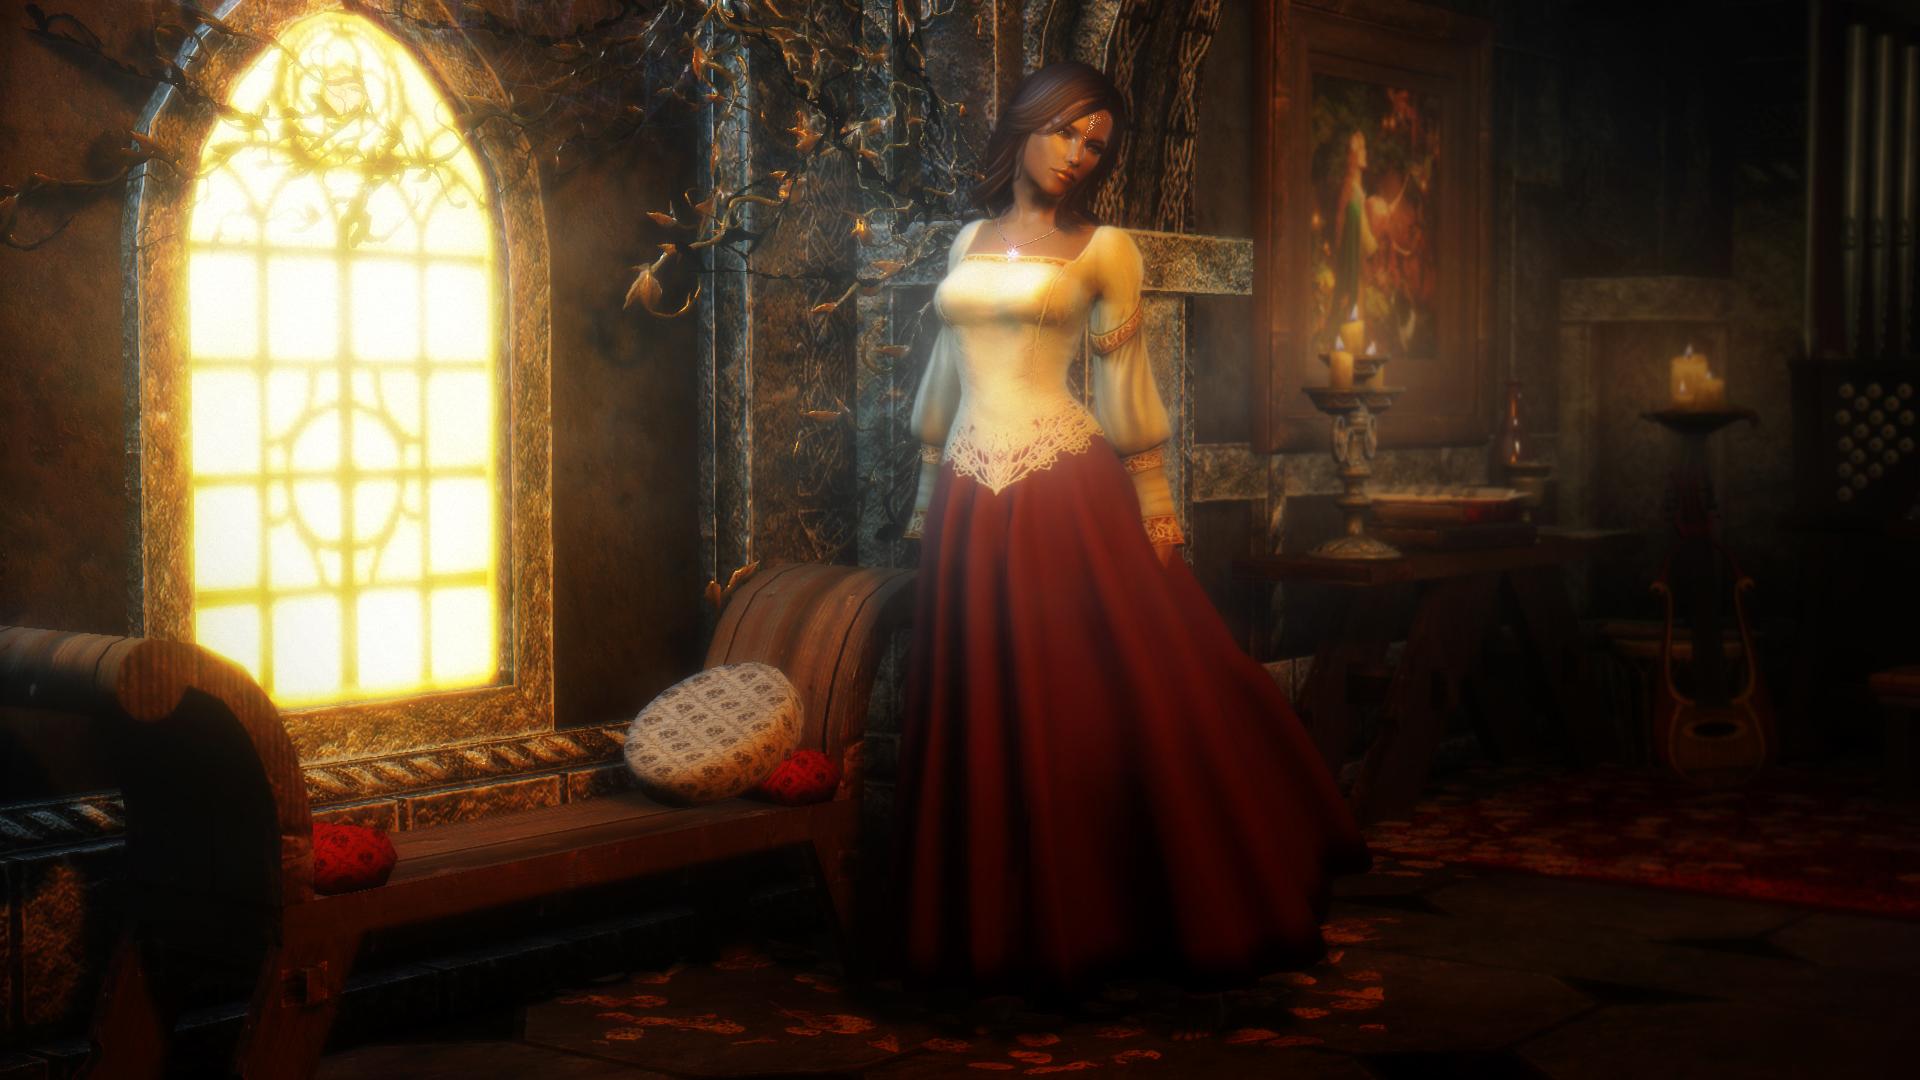 Skyrim Wedding Dress.Noble Wedding Dress Elder Scrolls Skyrim Clothing Images Page 2